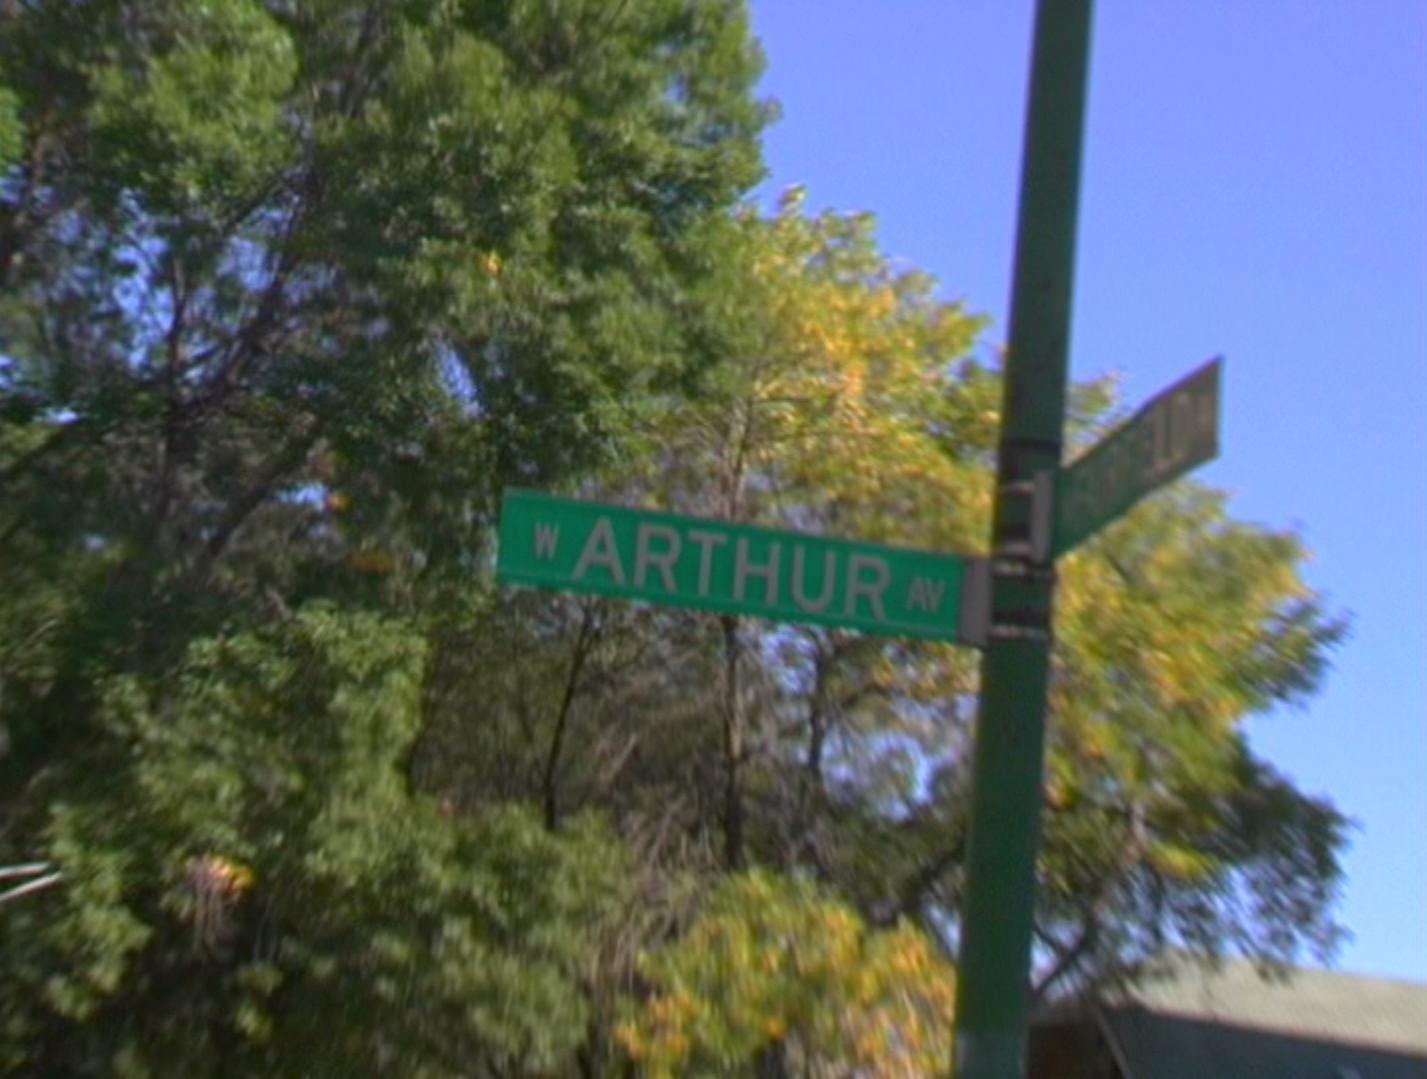 Arthur Drive